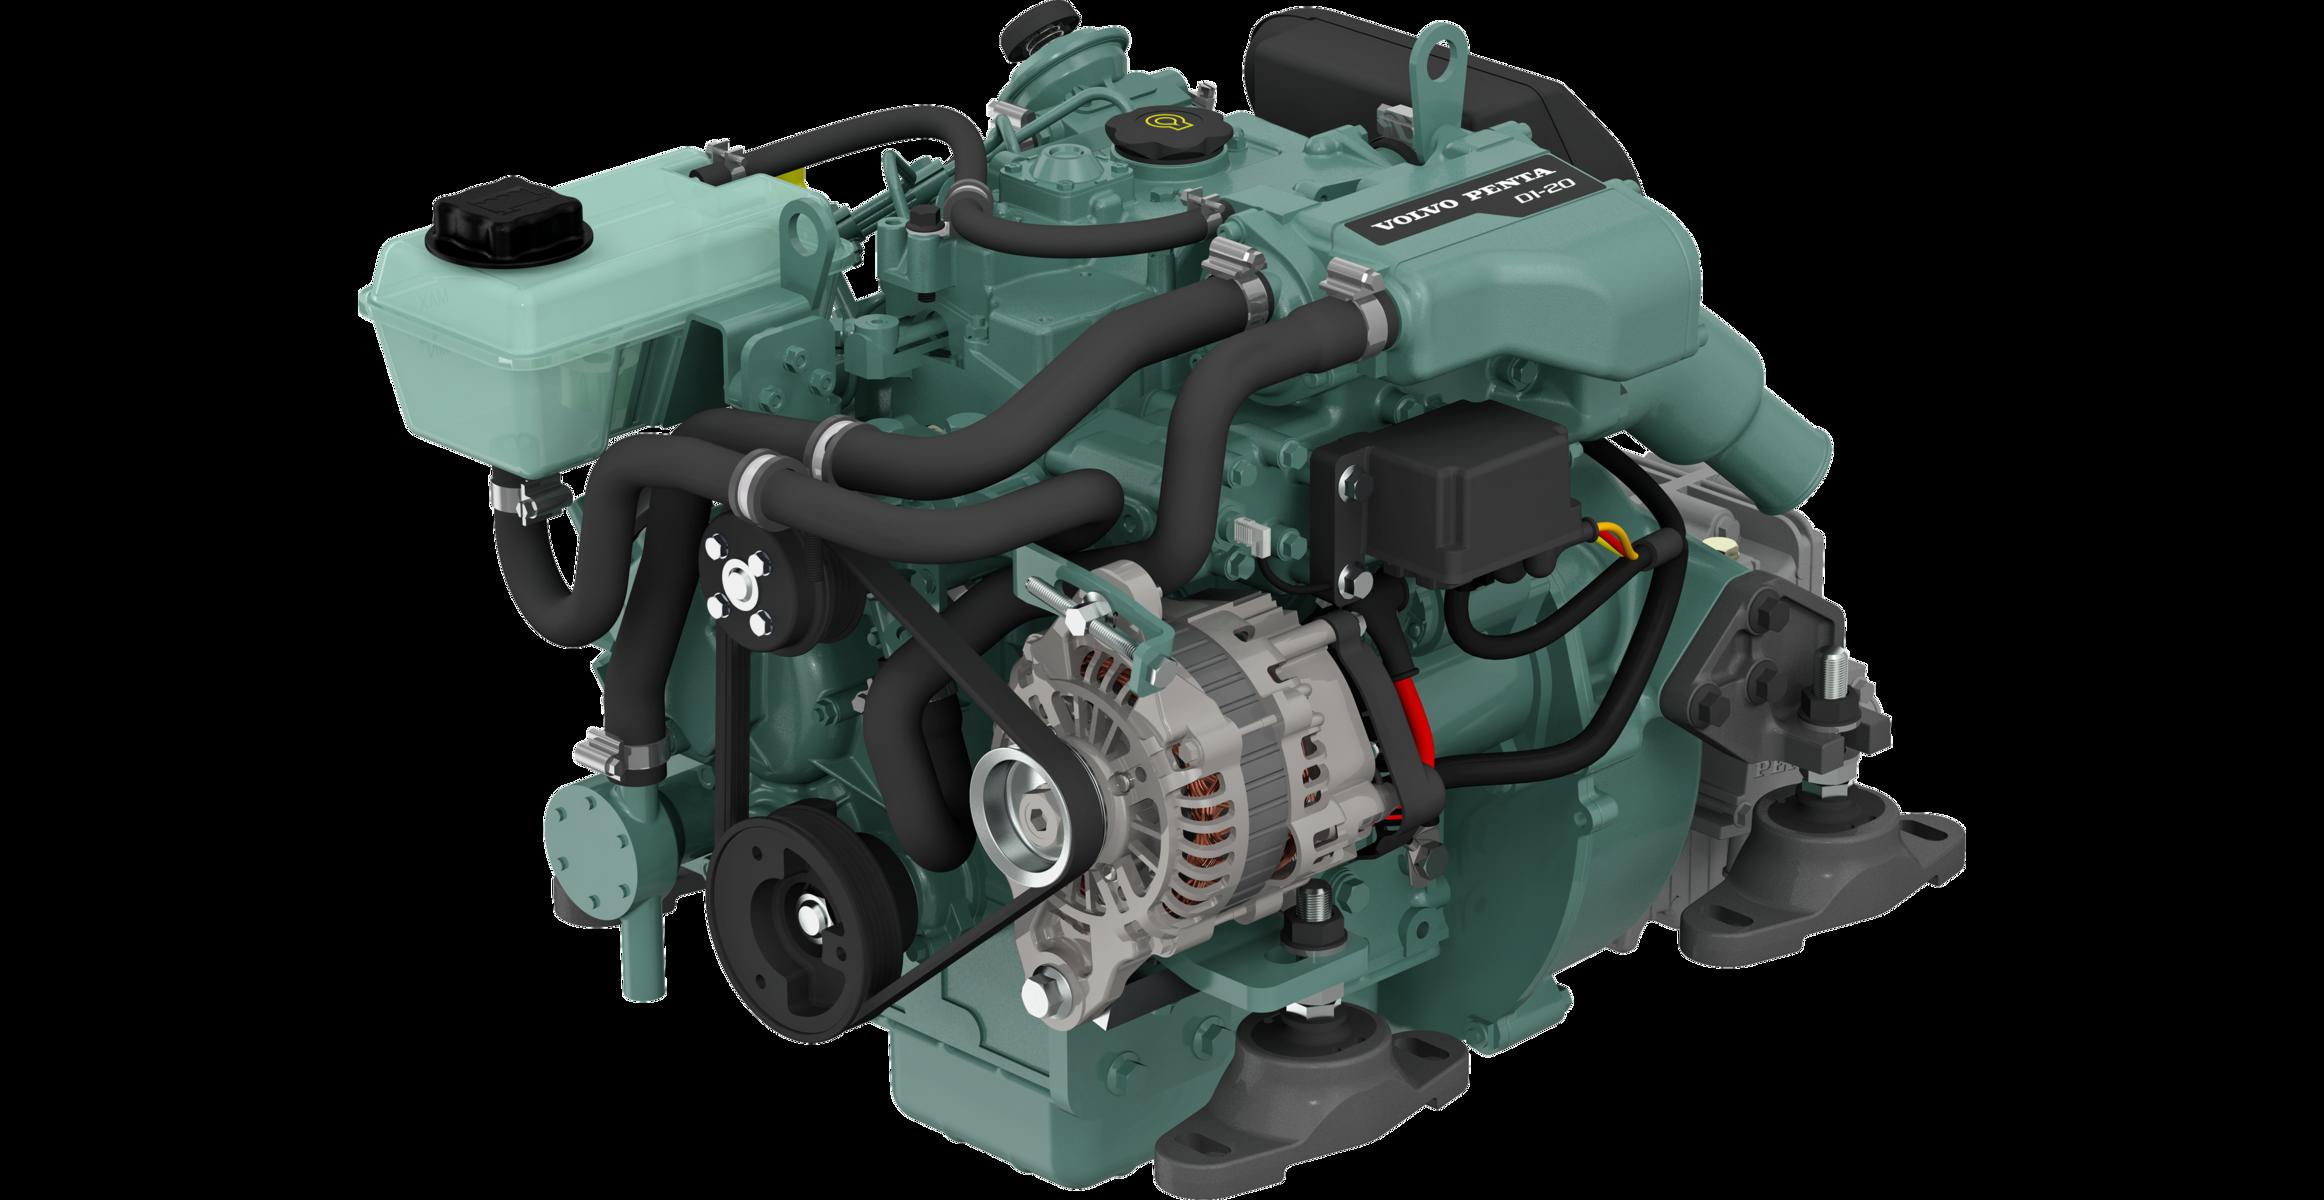 13 Concept of Volvo 2020 Marine Diesel Manual 2 Engine for Volvo 2020 Marine Diesel Manual 2